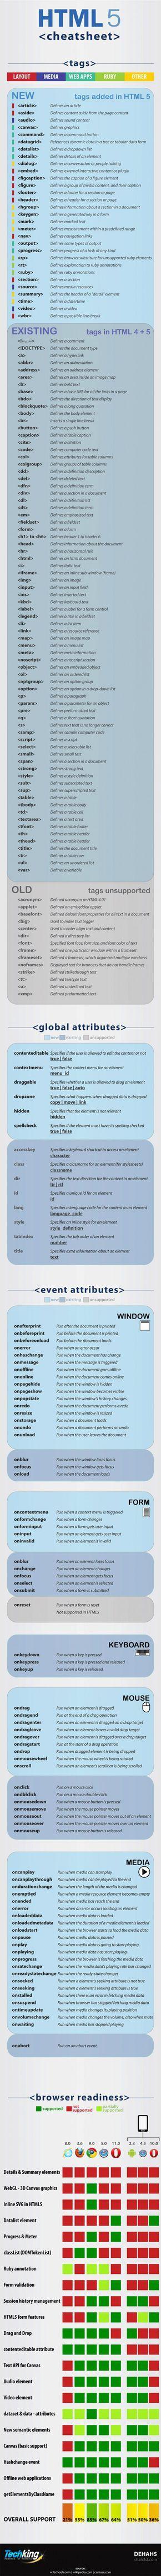 HTML 5 Cheat Sheet